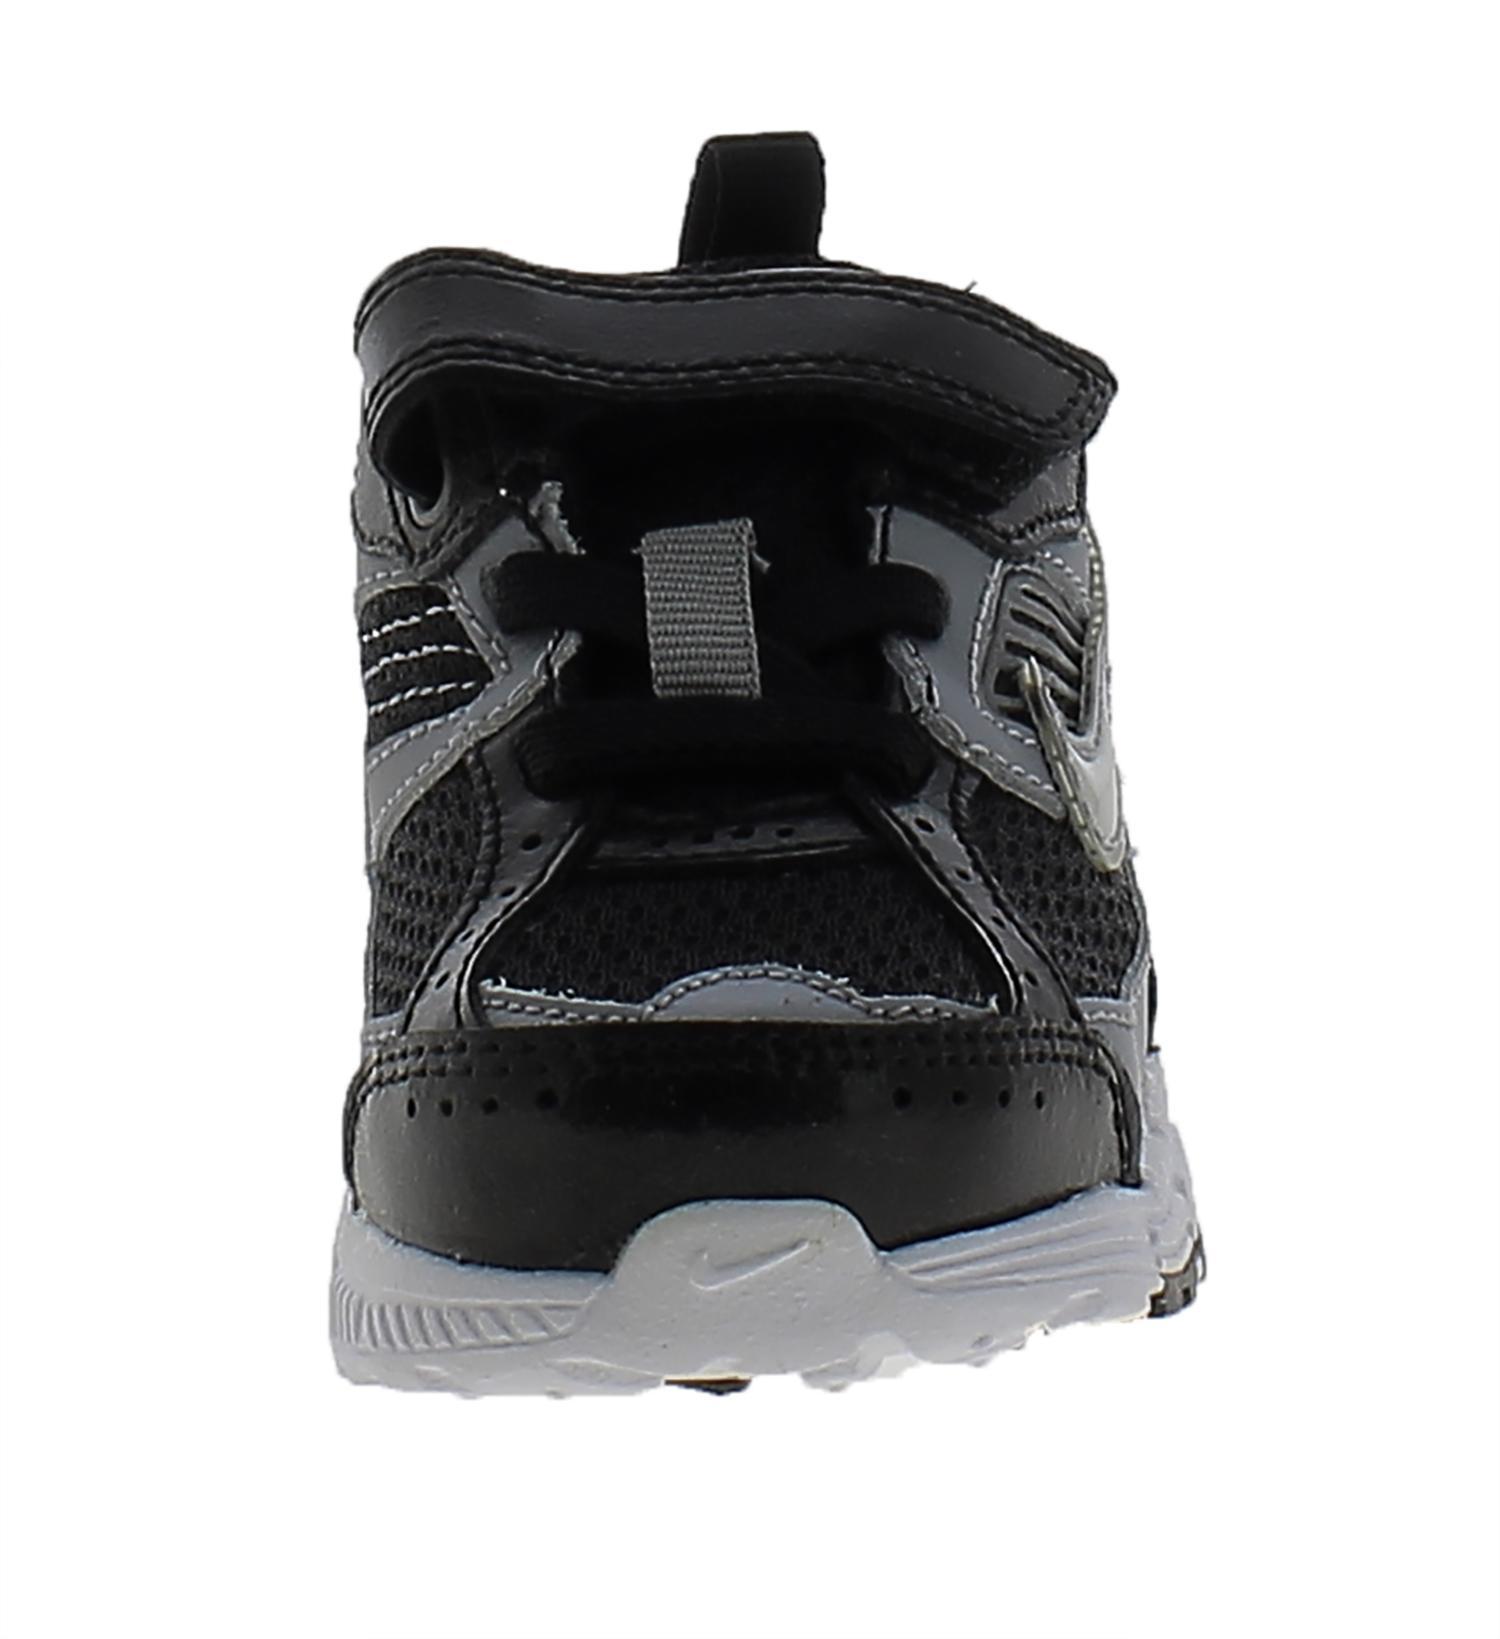 nike nike dart 8 (td) scarpe bambino nere pelle tela 395827